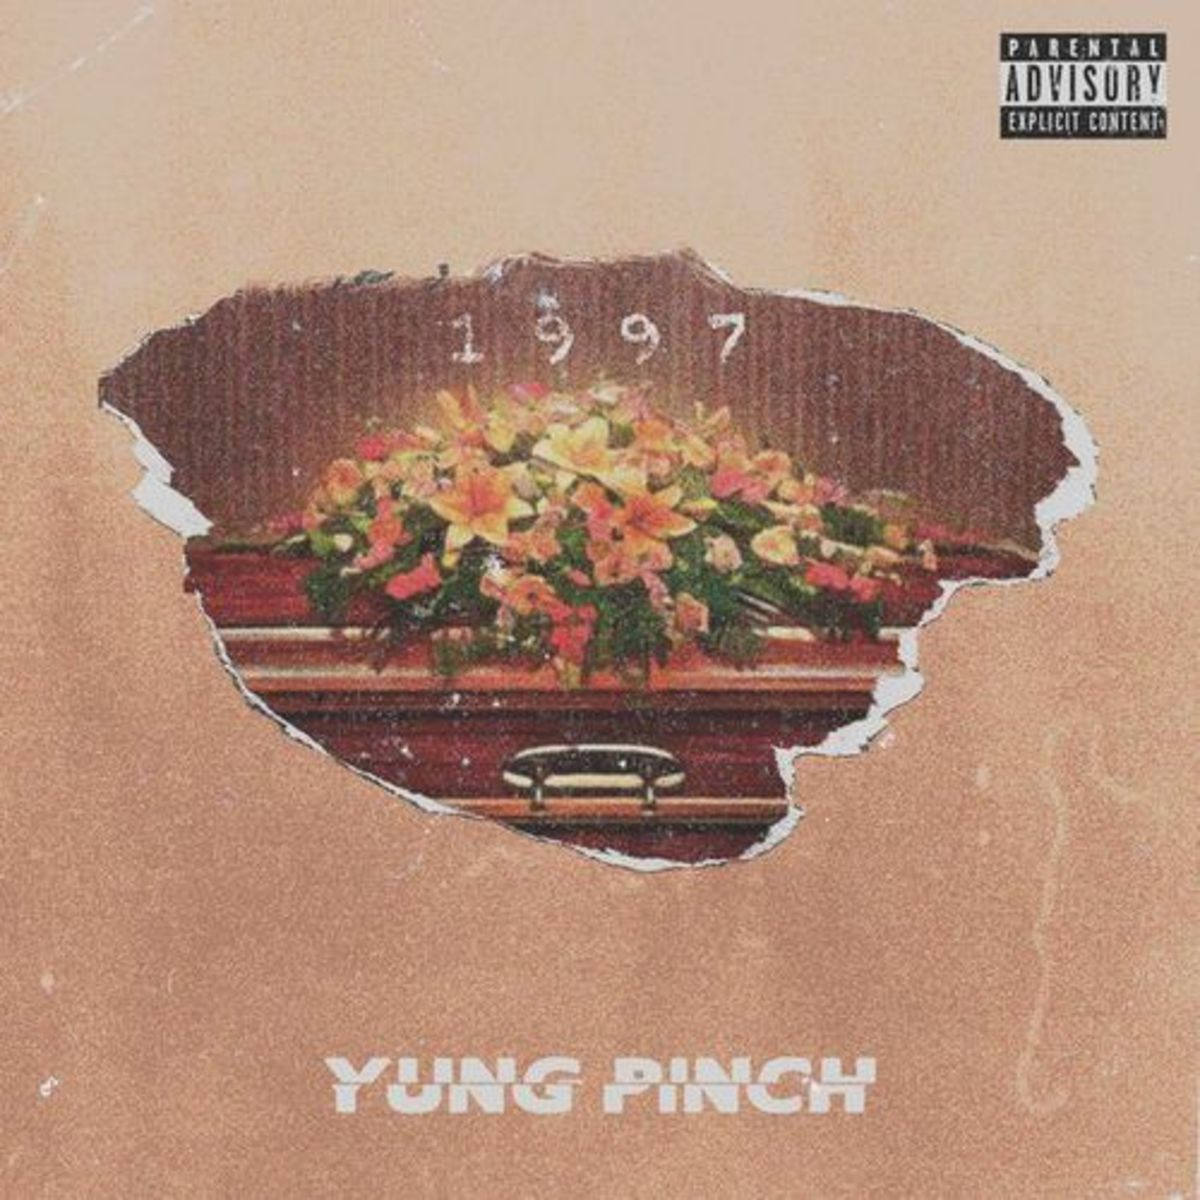 yung-pinch-1997.jpg